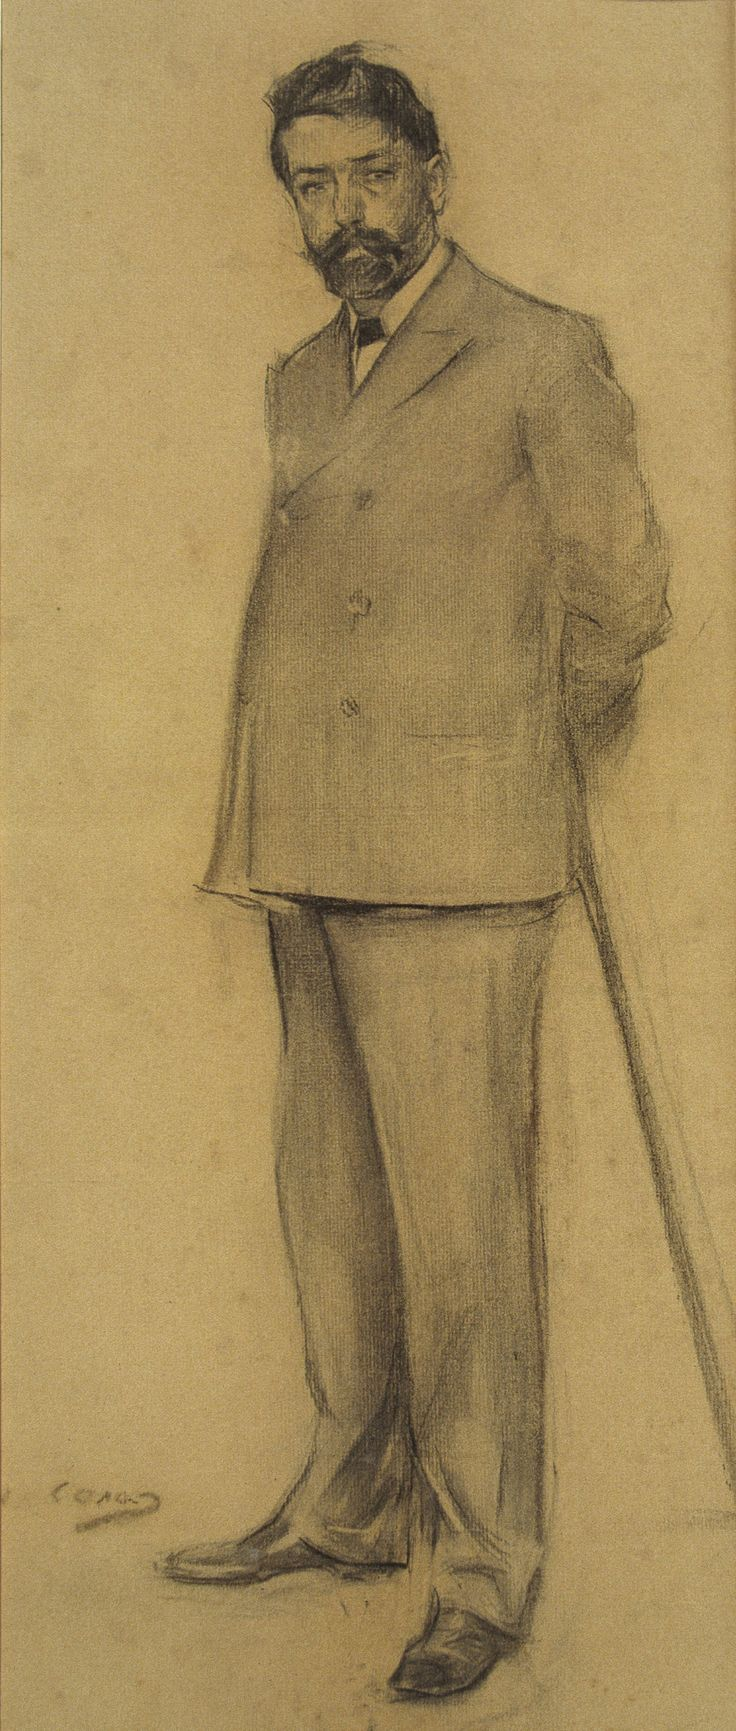 Lluís Graner by Ramon Casas i Carbó (Catalan/Spanish 1866-1932)